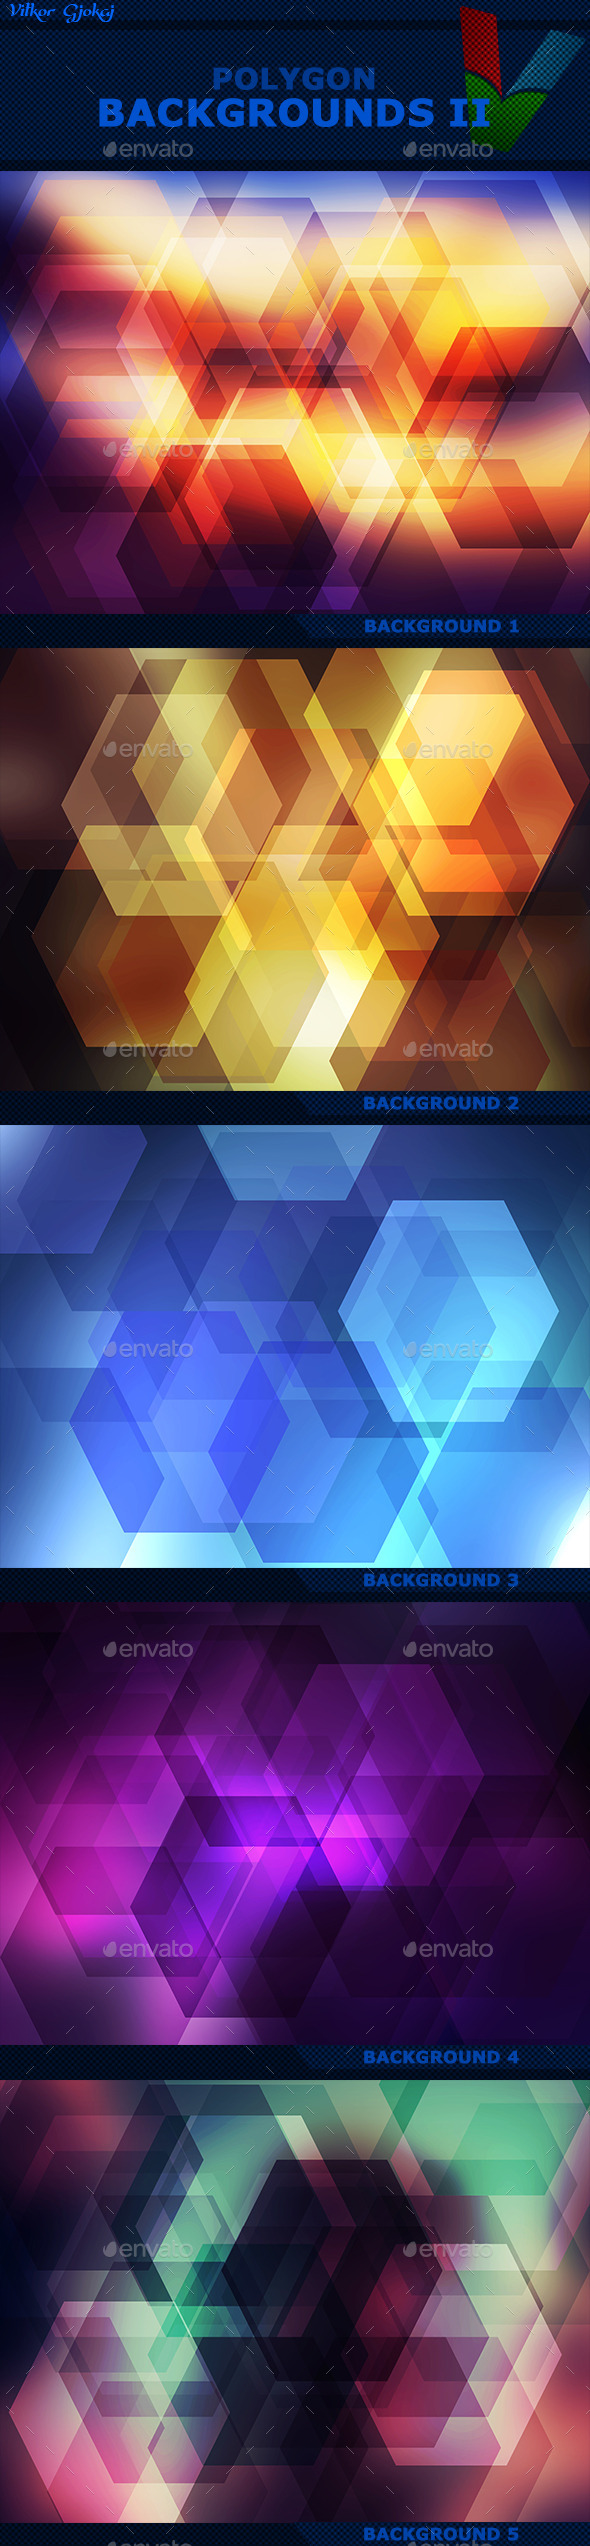 Polygon Backgrounds II - Abstract Backgrounds